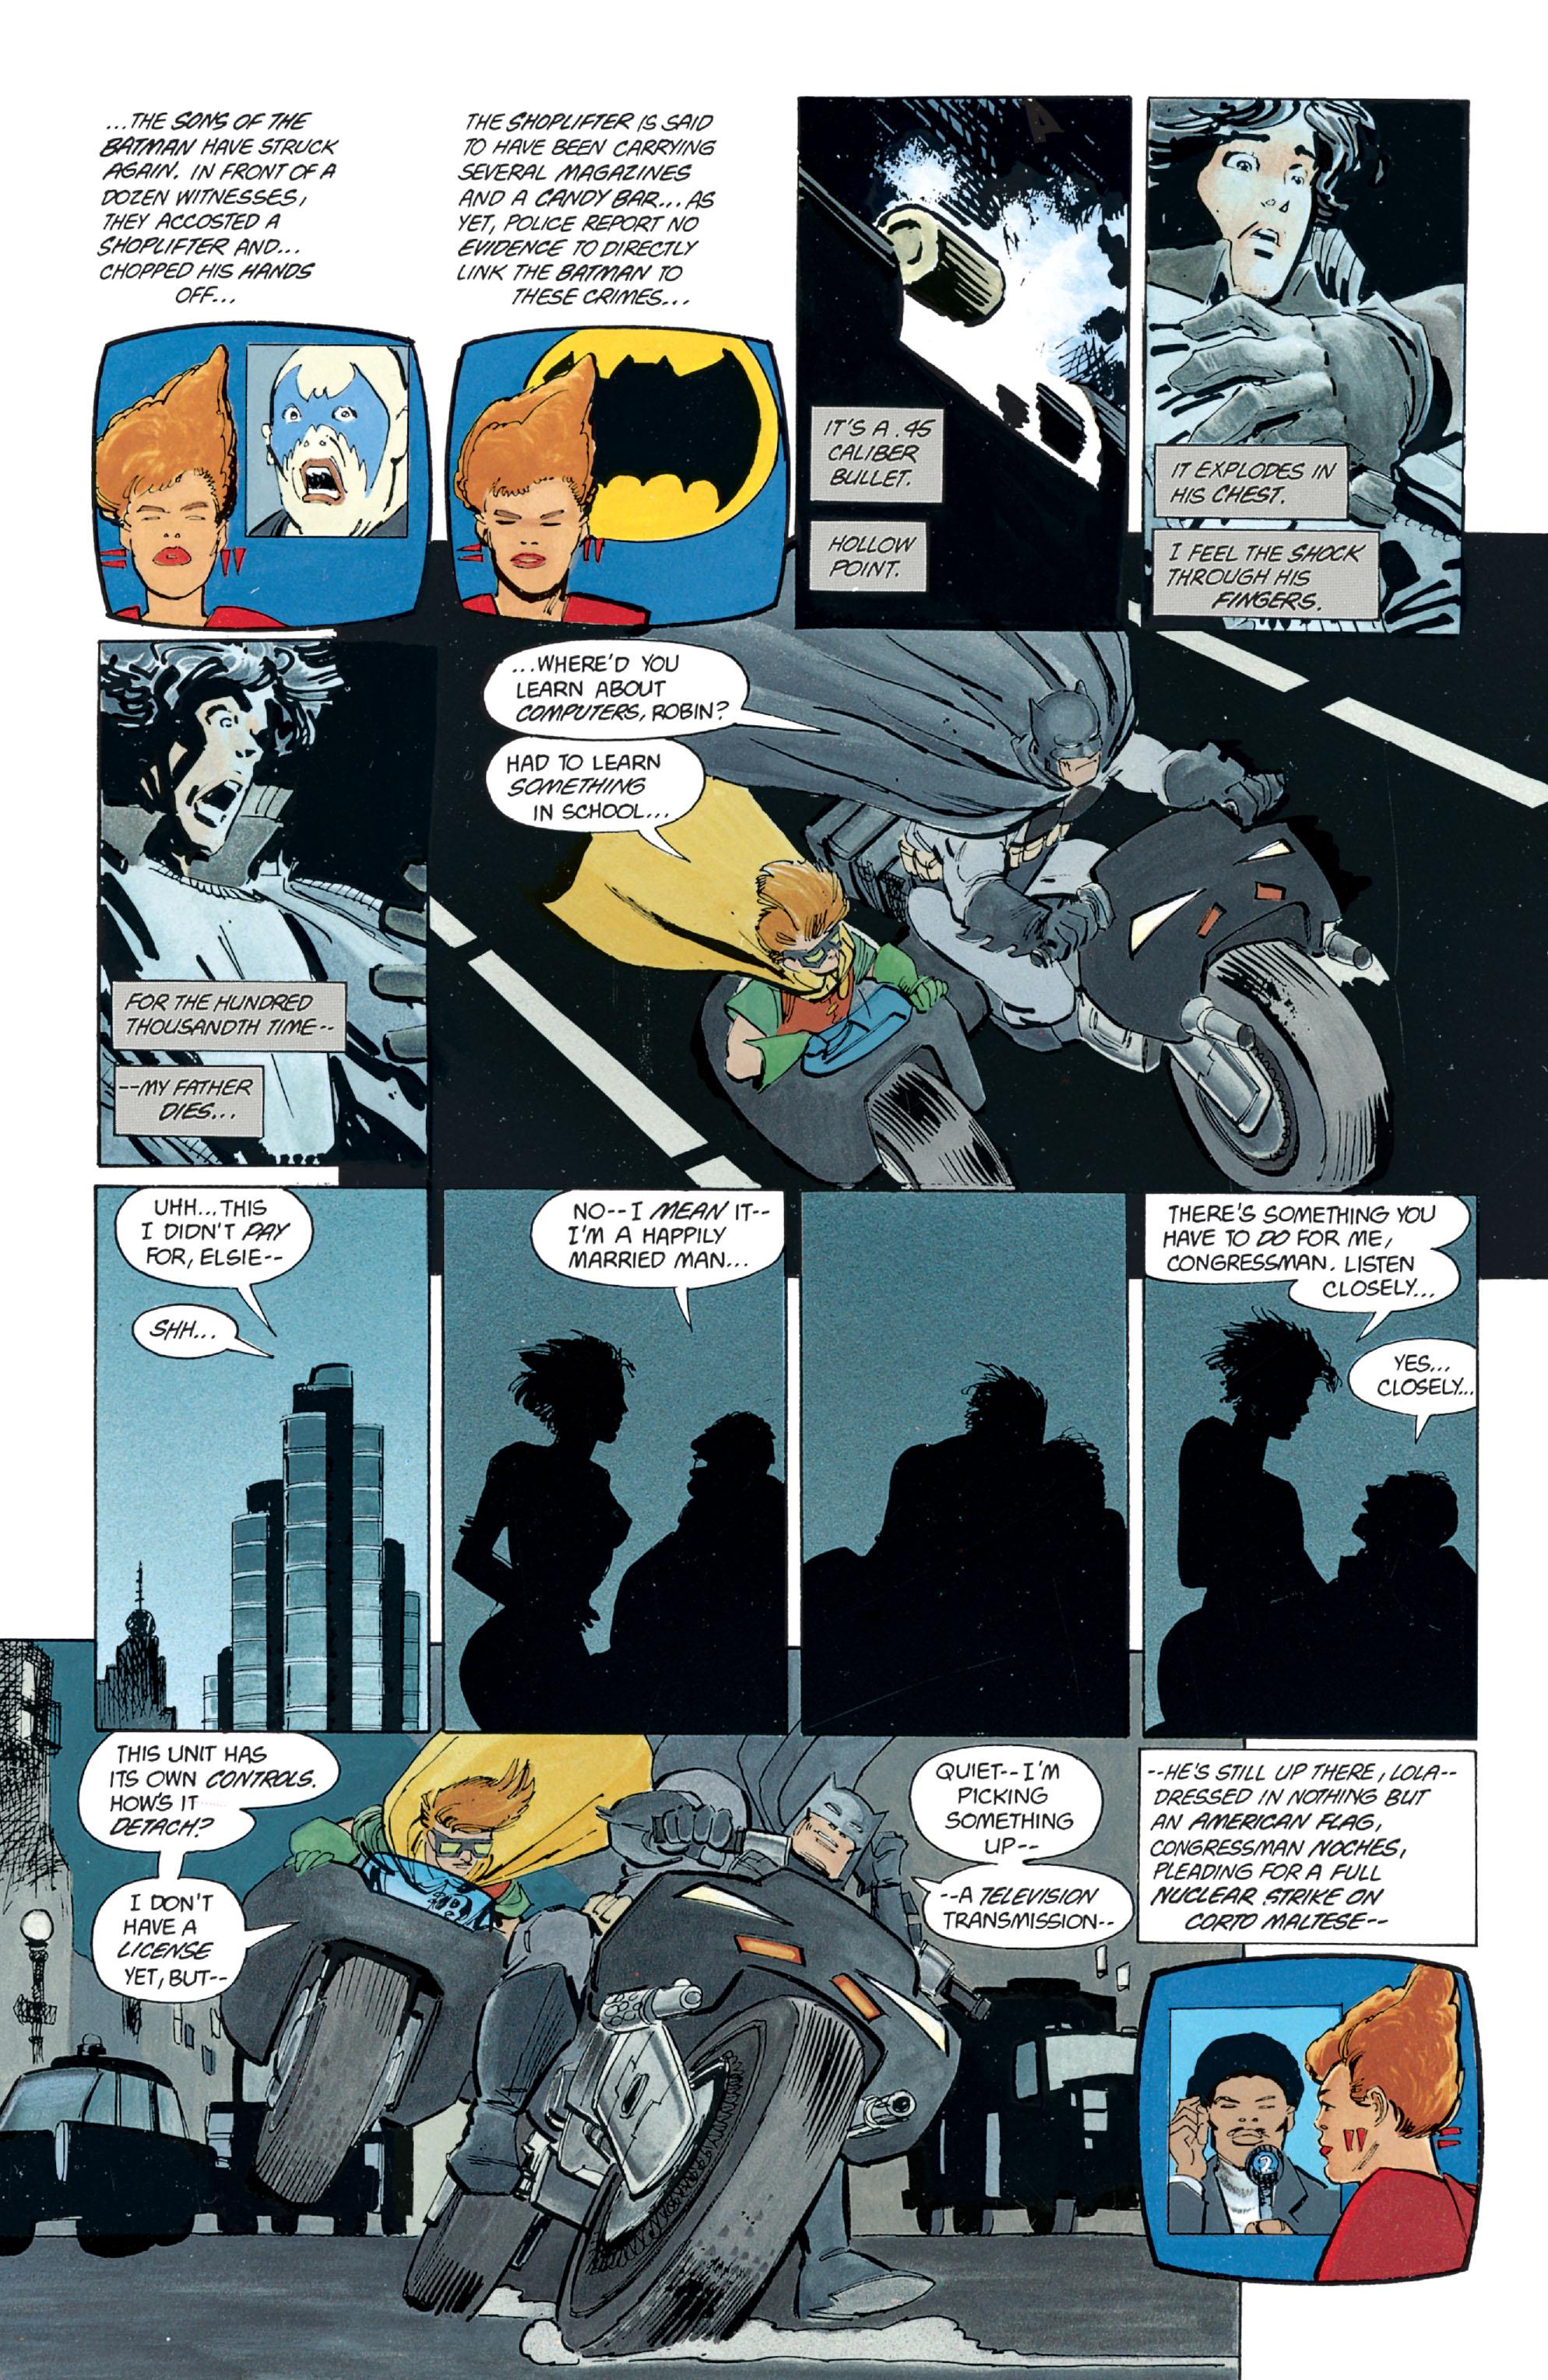 Psychology of Bruce Wayne 8FExxhV45tz2MmqGVdCppBMTiYD95NfT35Tc08sv7g9pgRsG7lq4O7jAxxVrx5FTgC5-c63DVjU1=s0